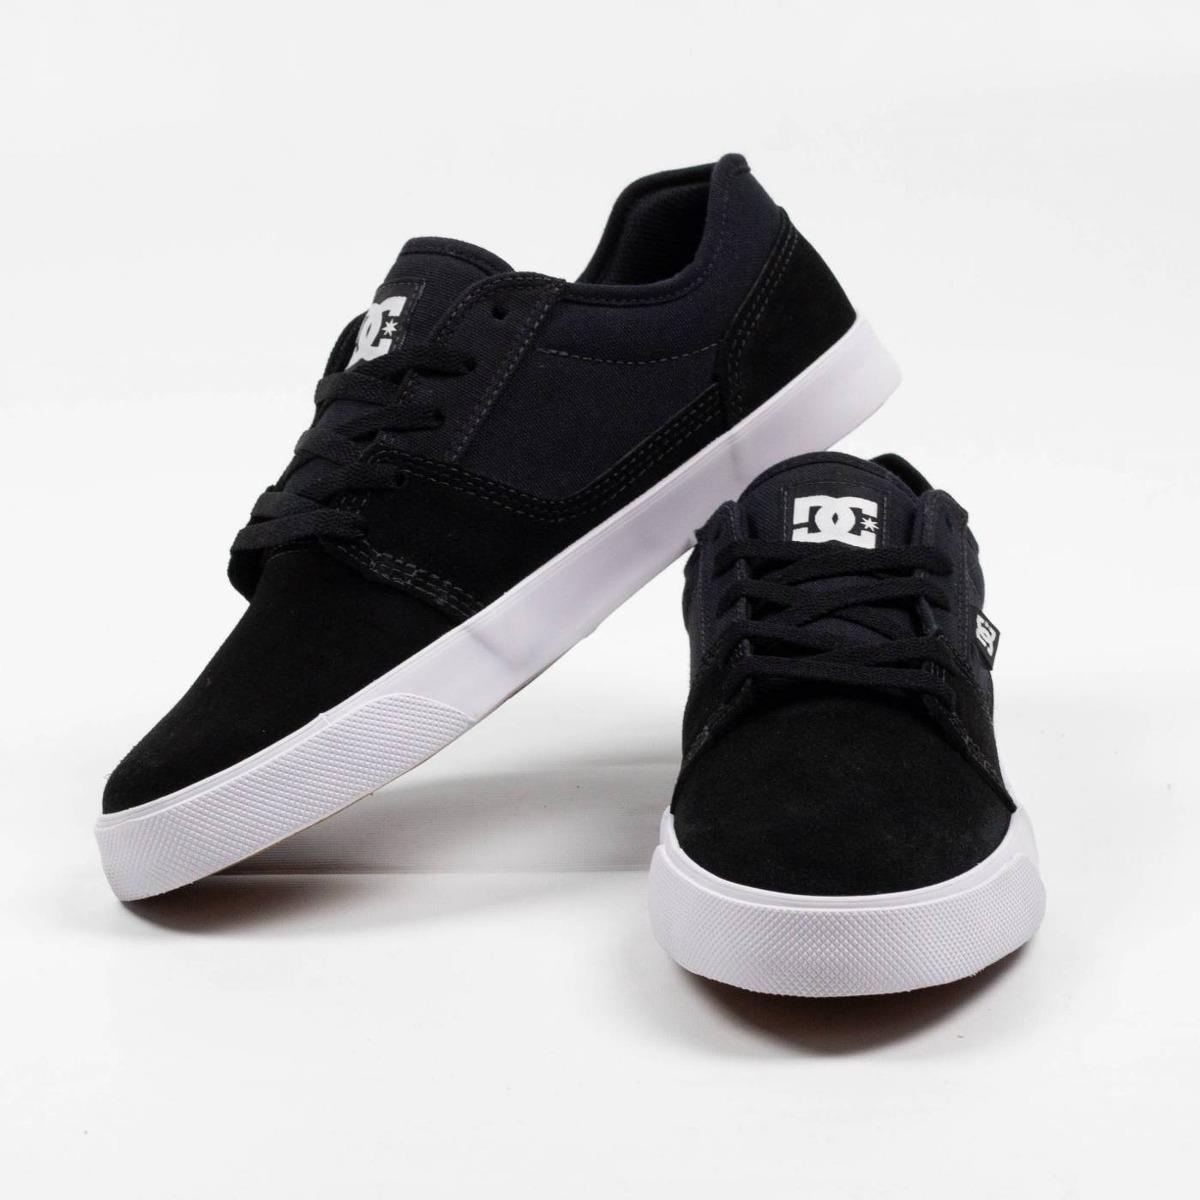 34a89d6971 tênis dc shoes tonik preto branco original. Carregando zoom.